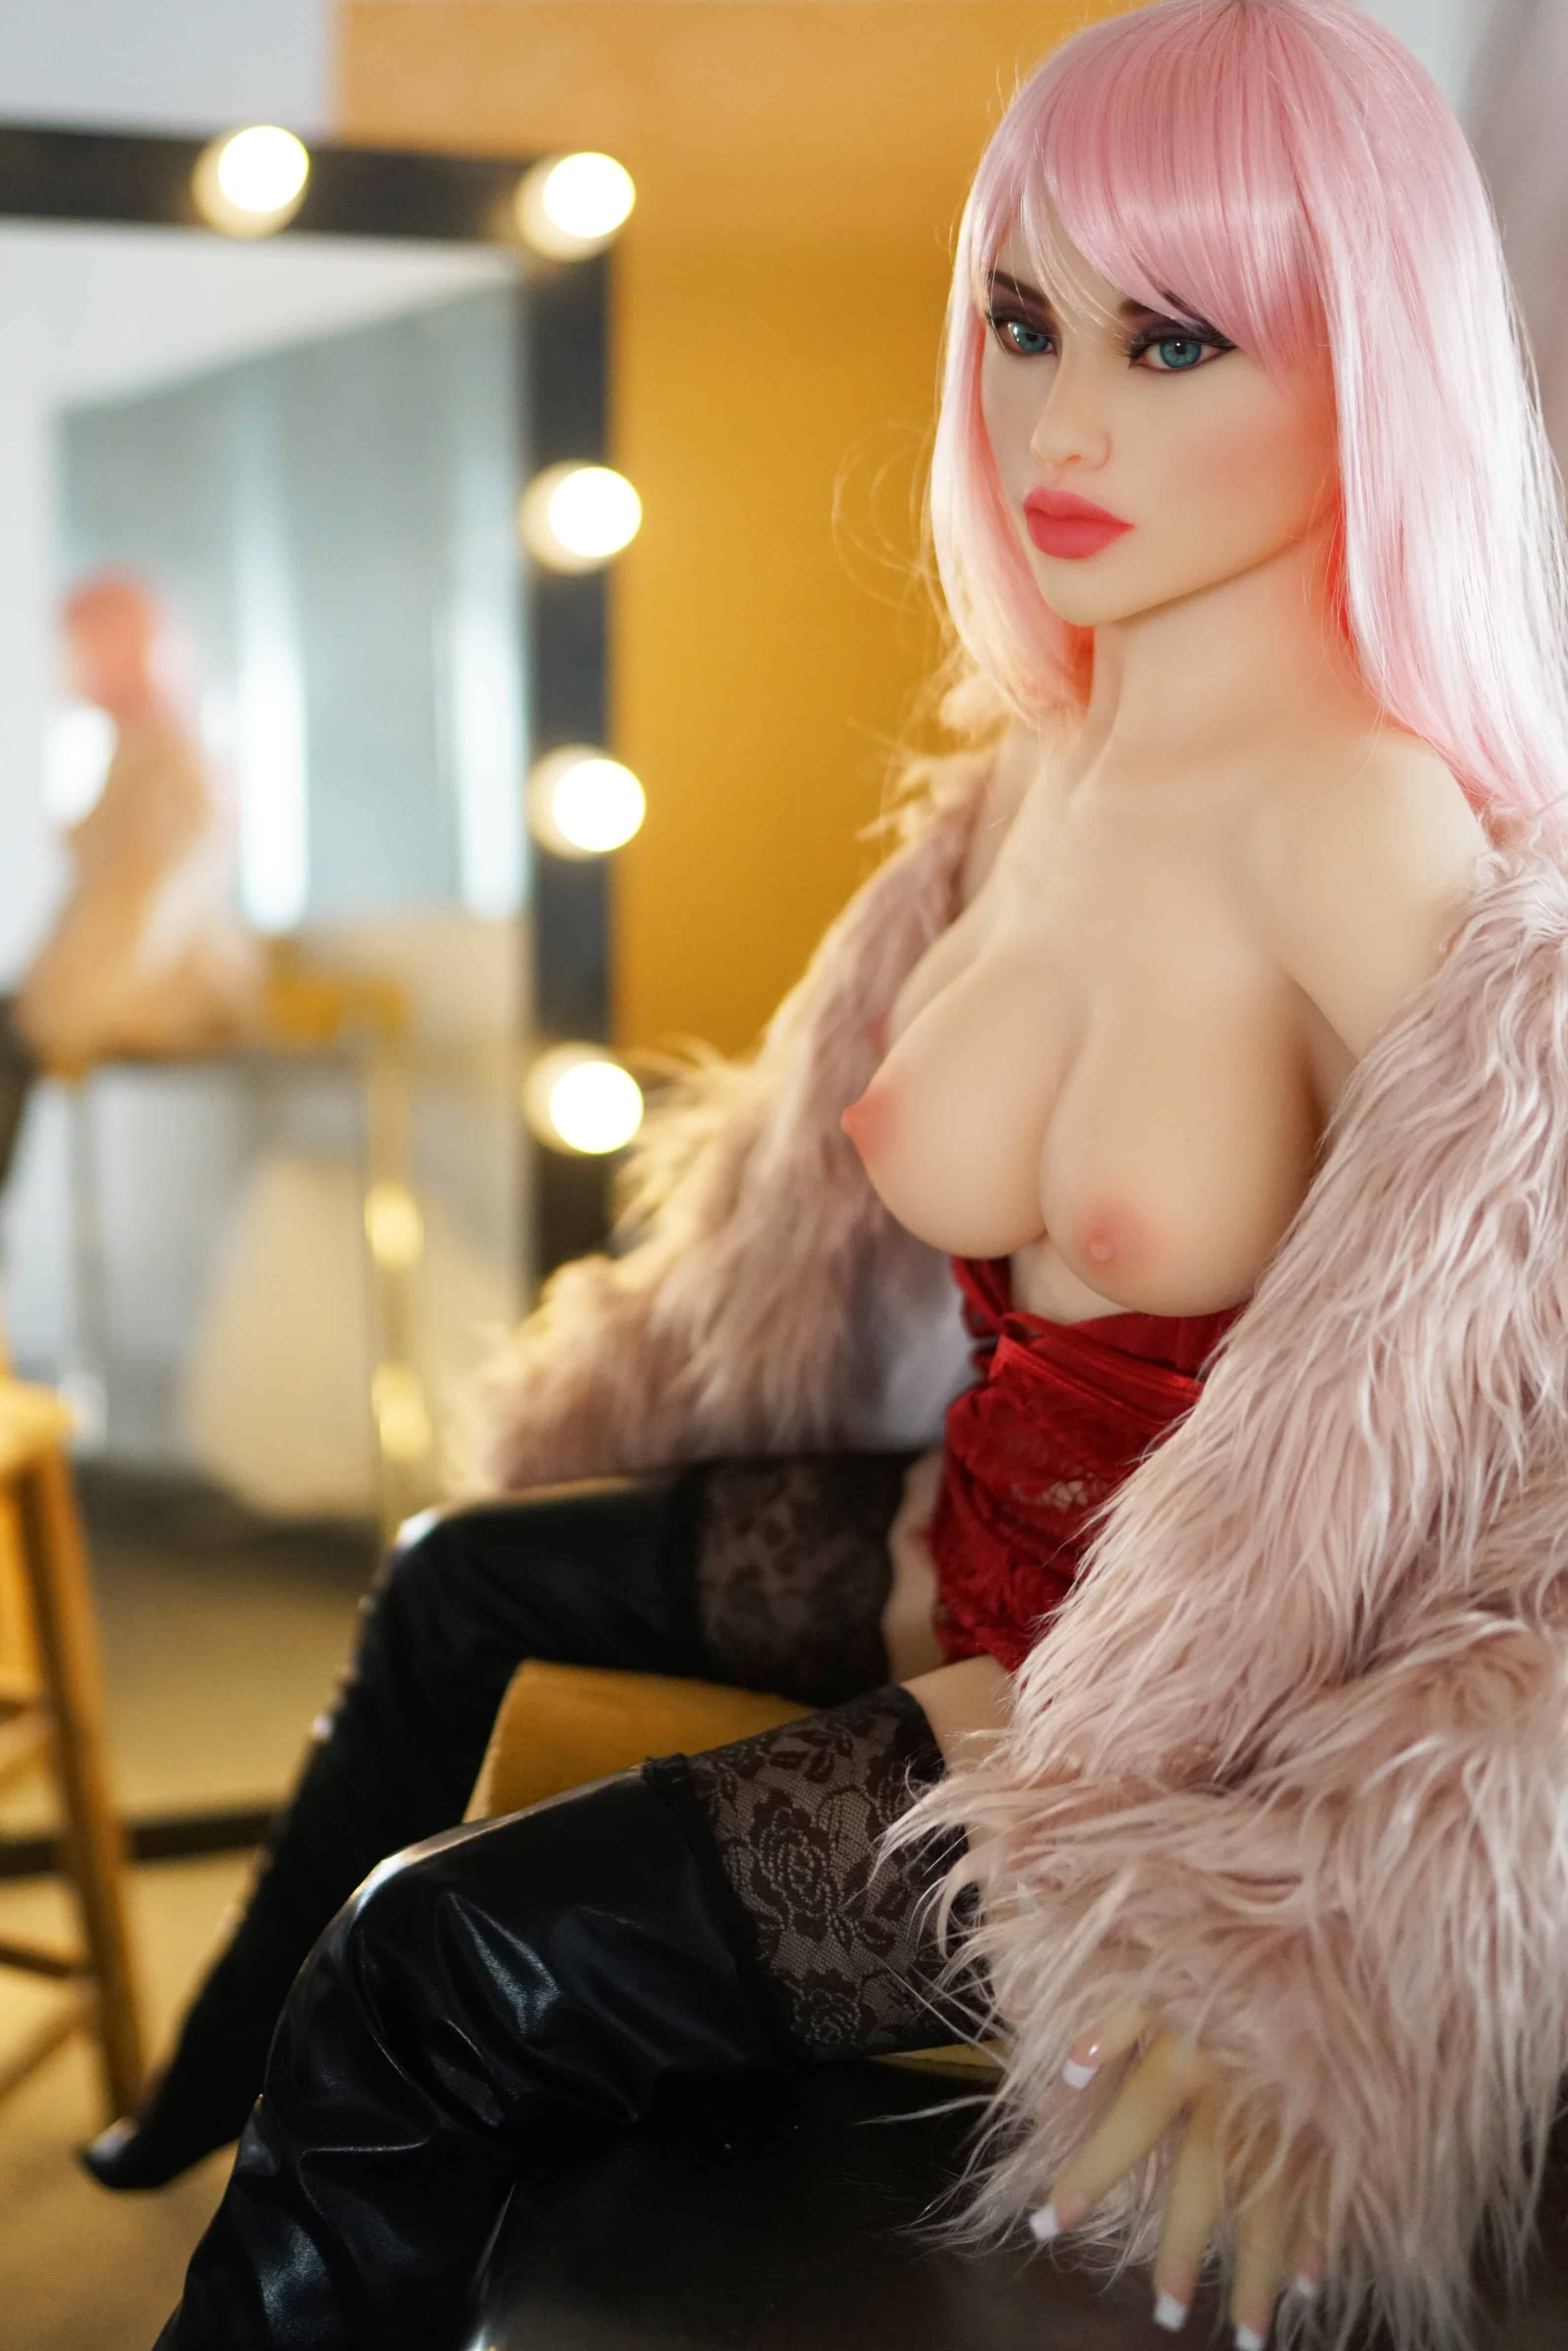 Fantasy-Sex-Dolls-Venus-From-Dirty-Knights-Sex-Dolls-3-breasts-1 (8)